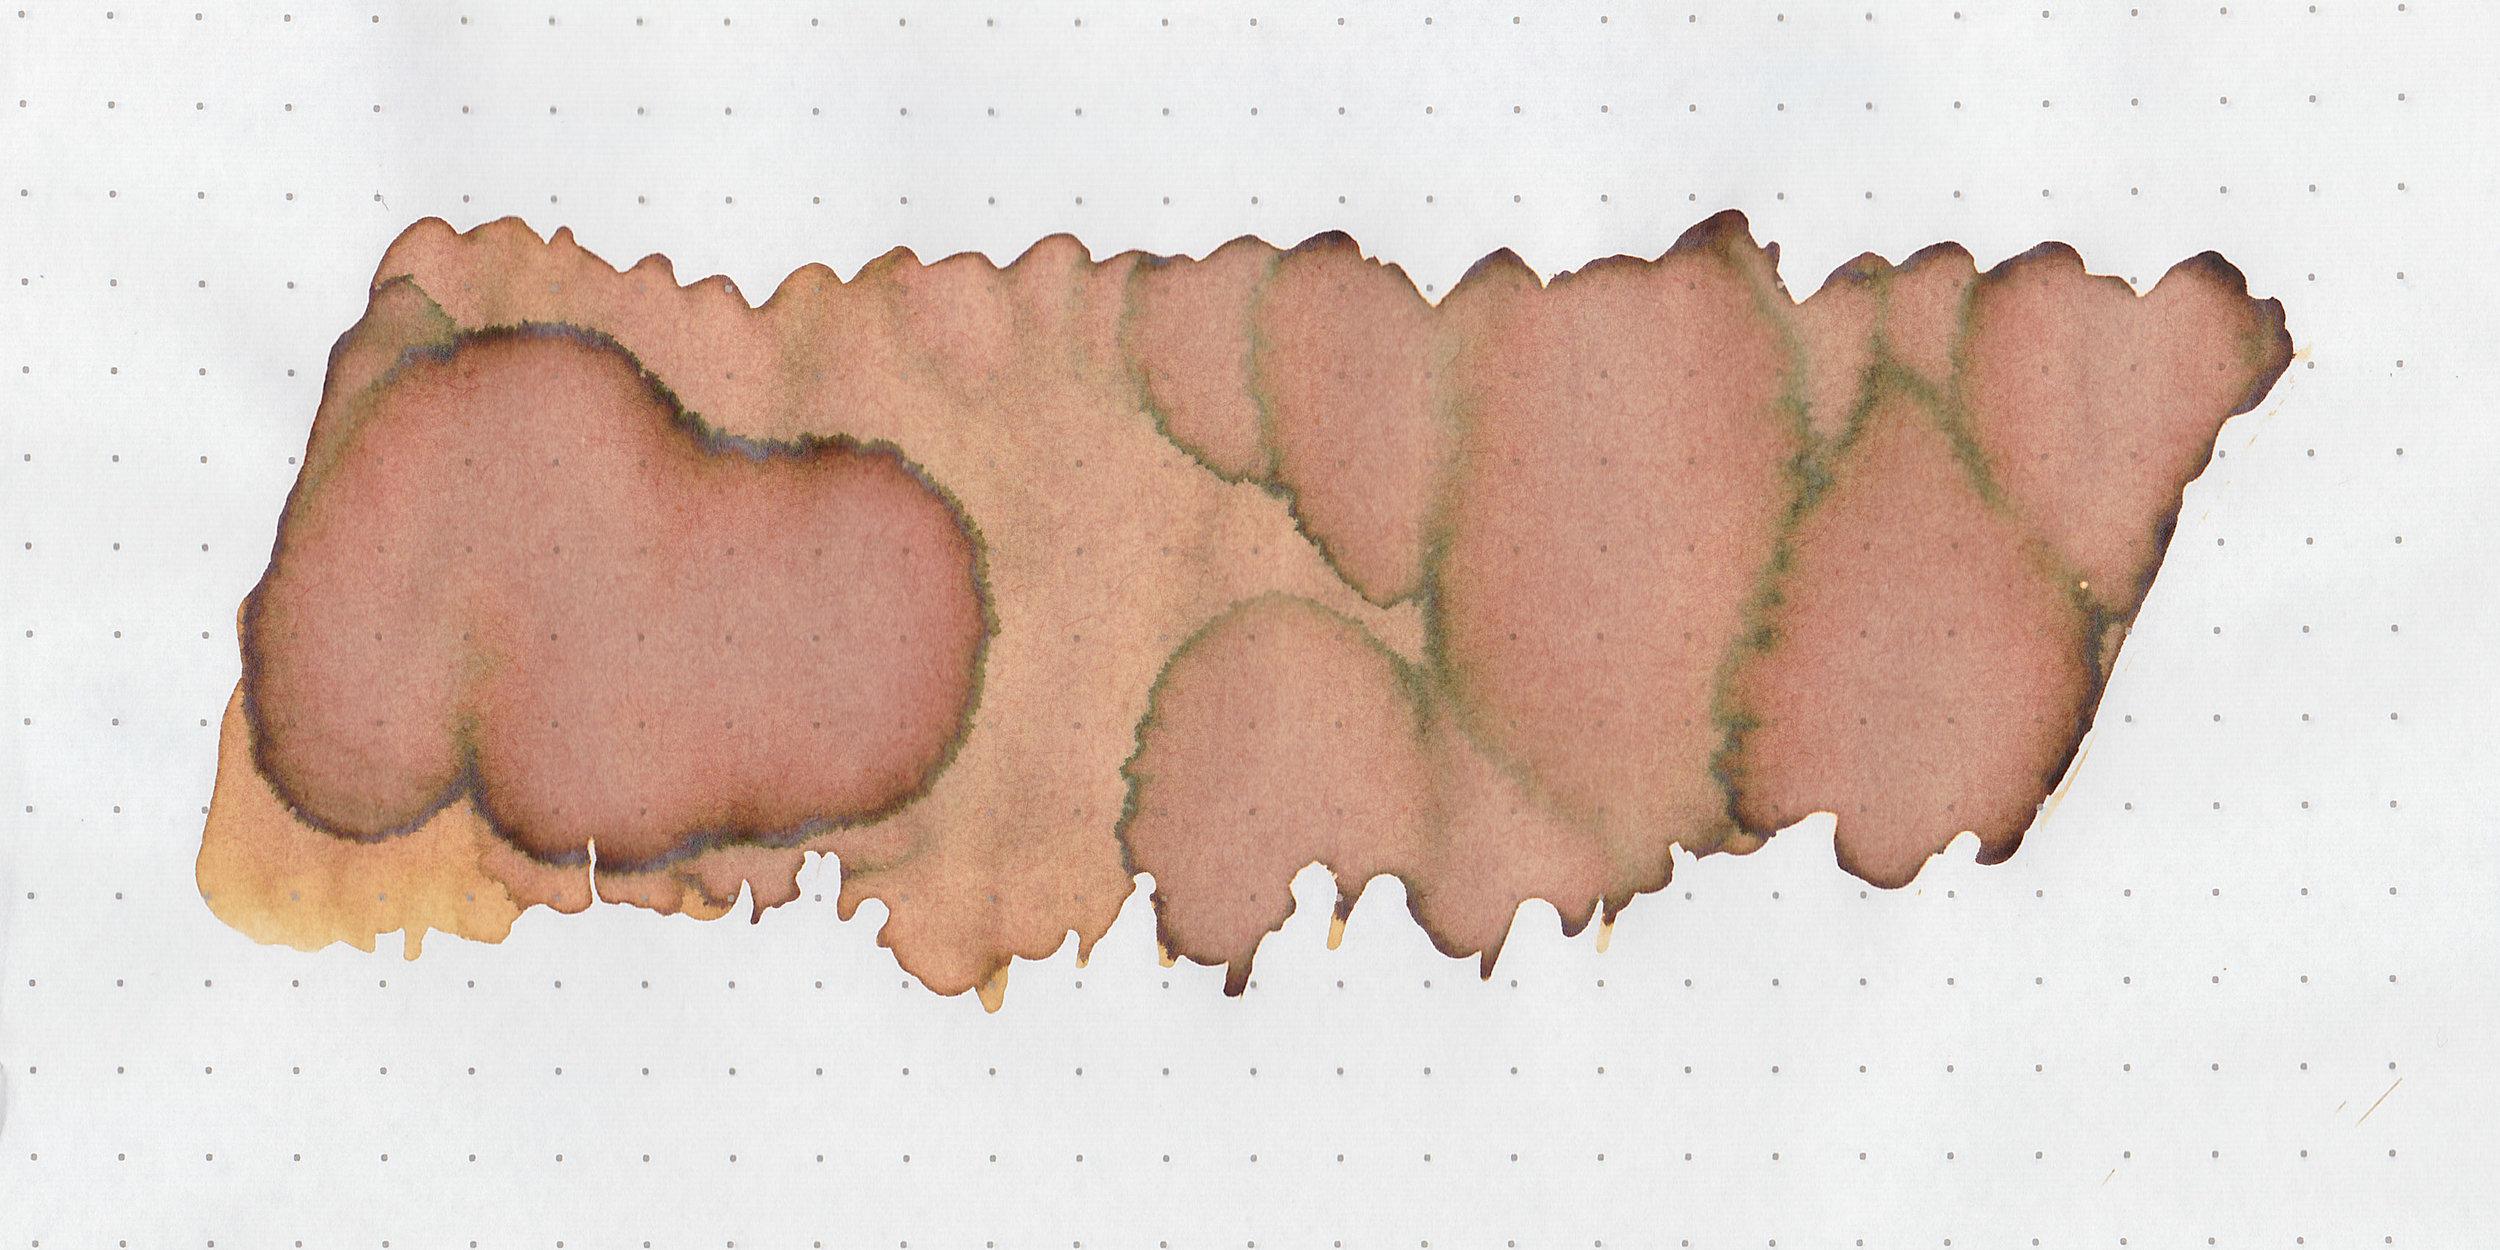 fc-honeycomb-3.jpg